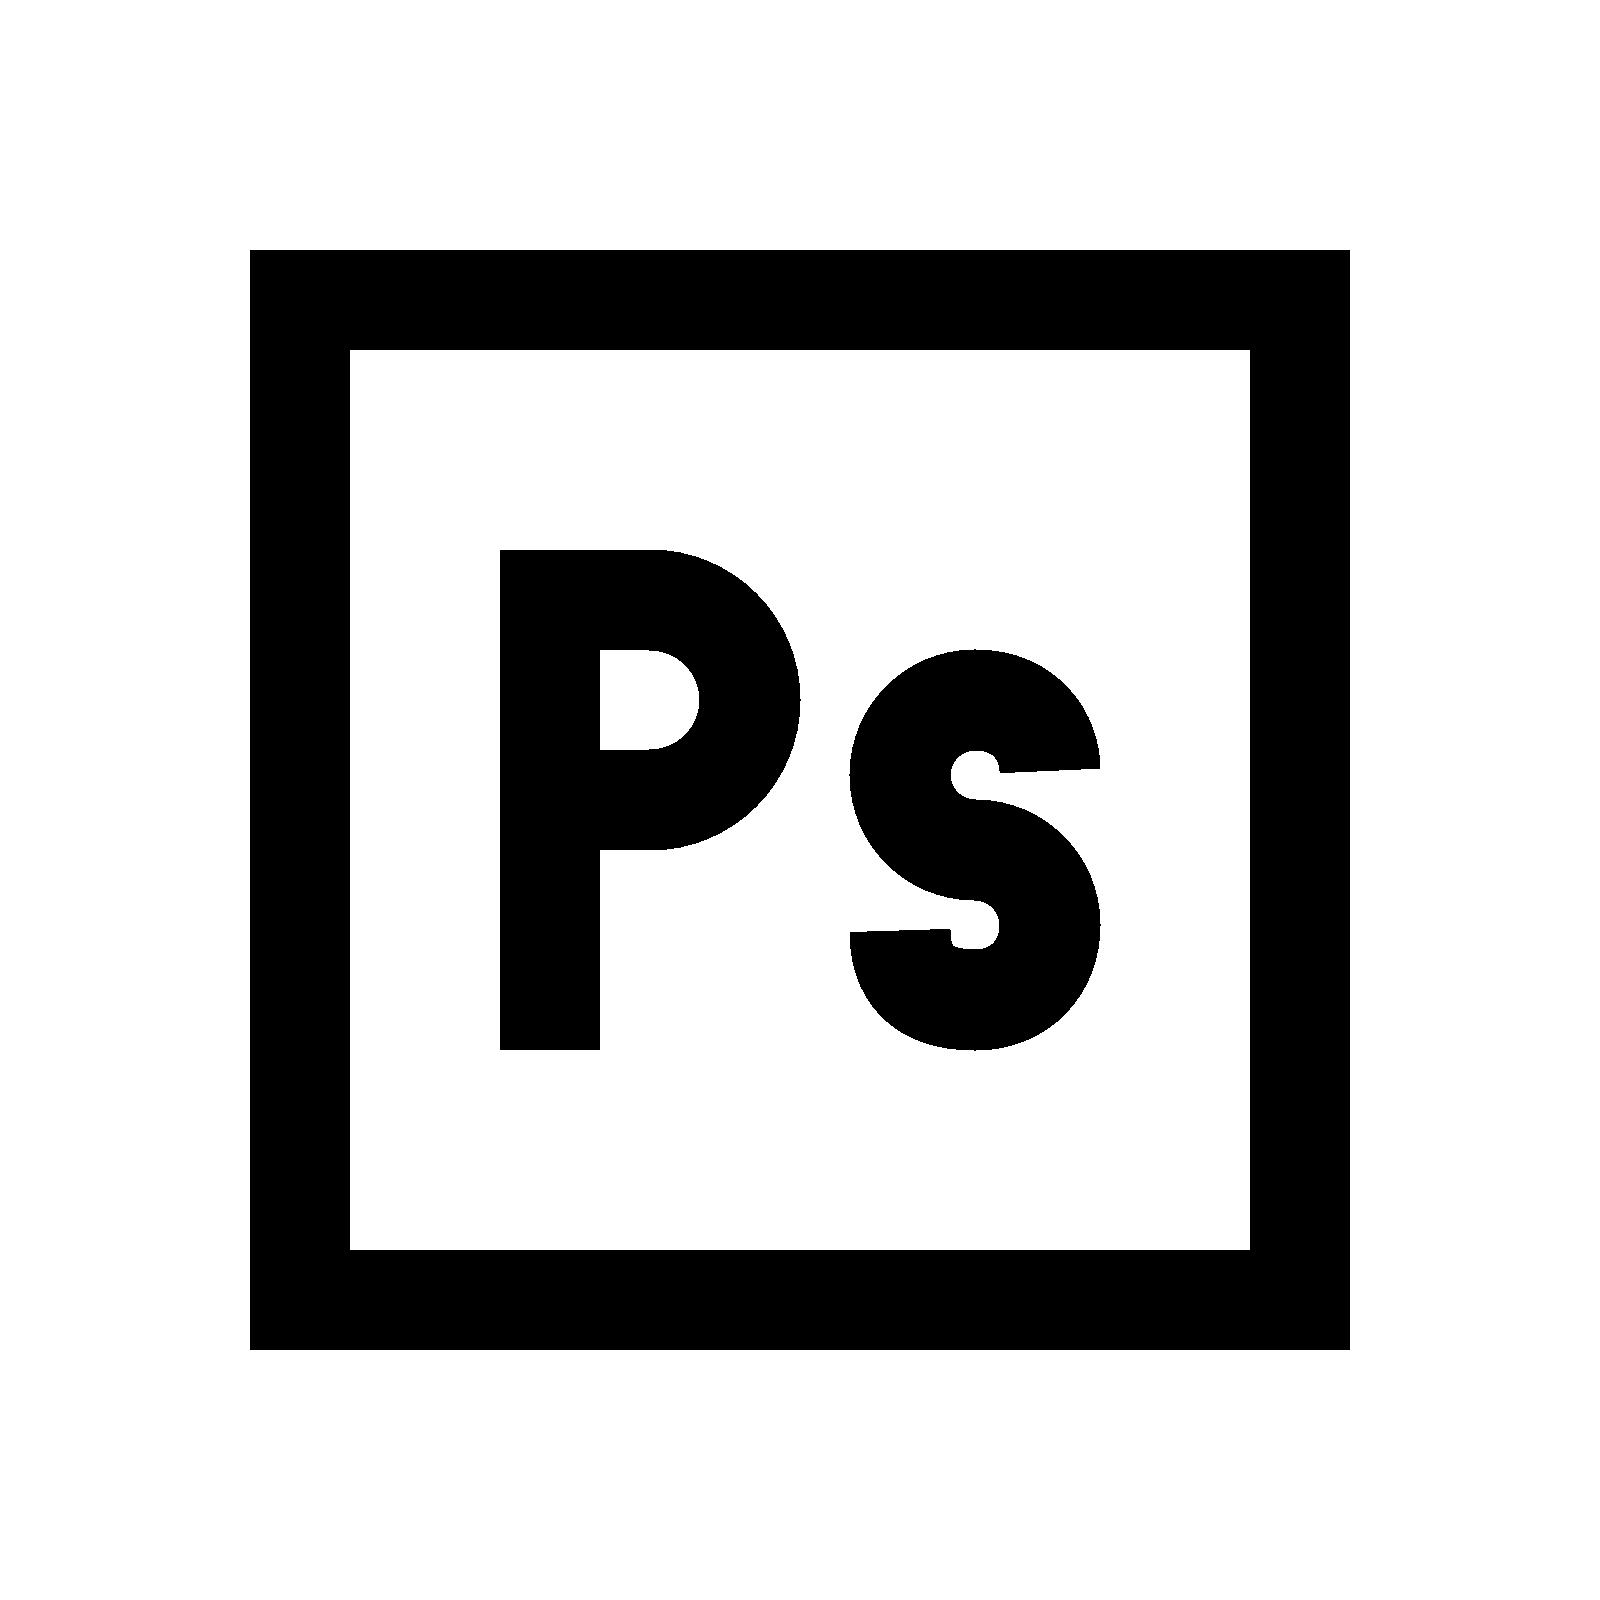 Photoshop Logo PNG - 9692